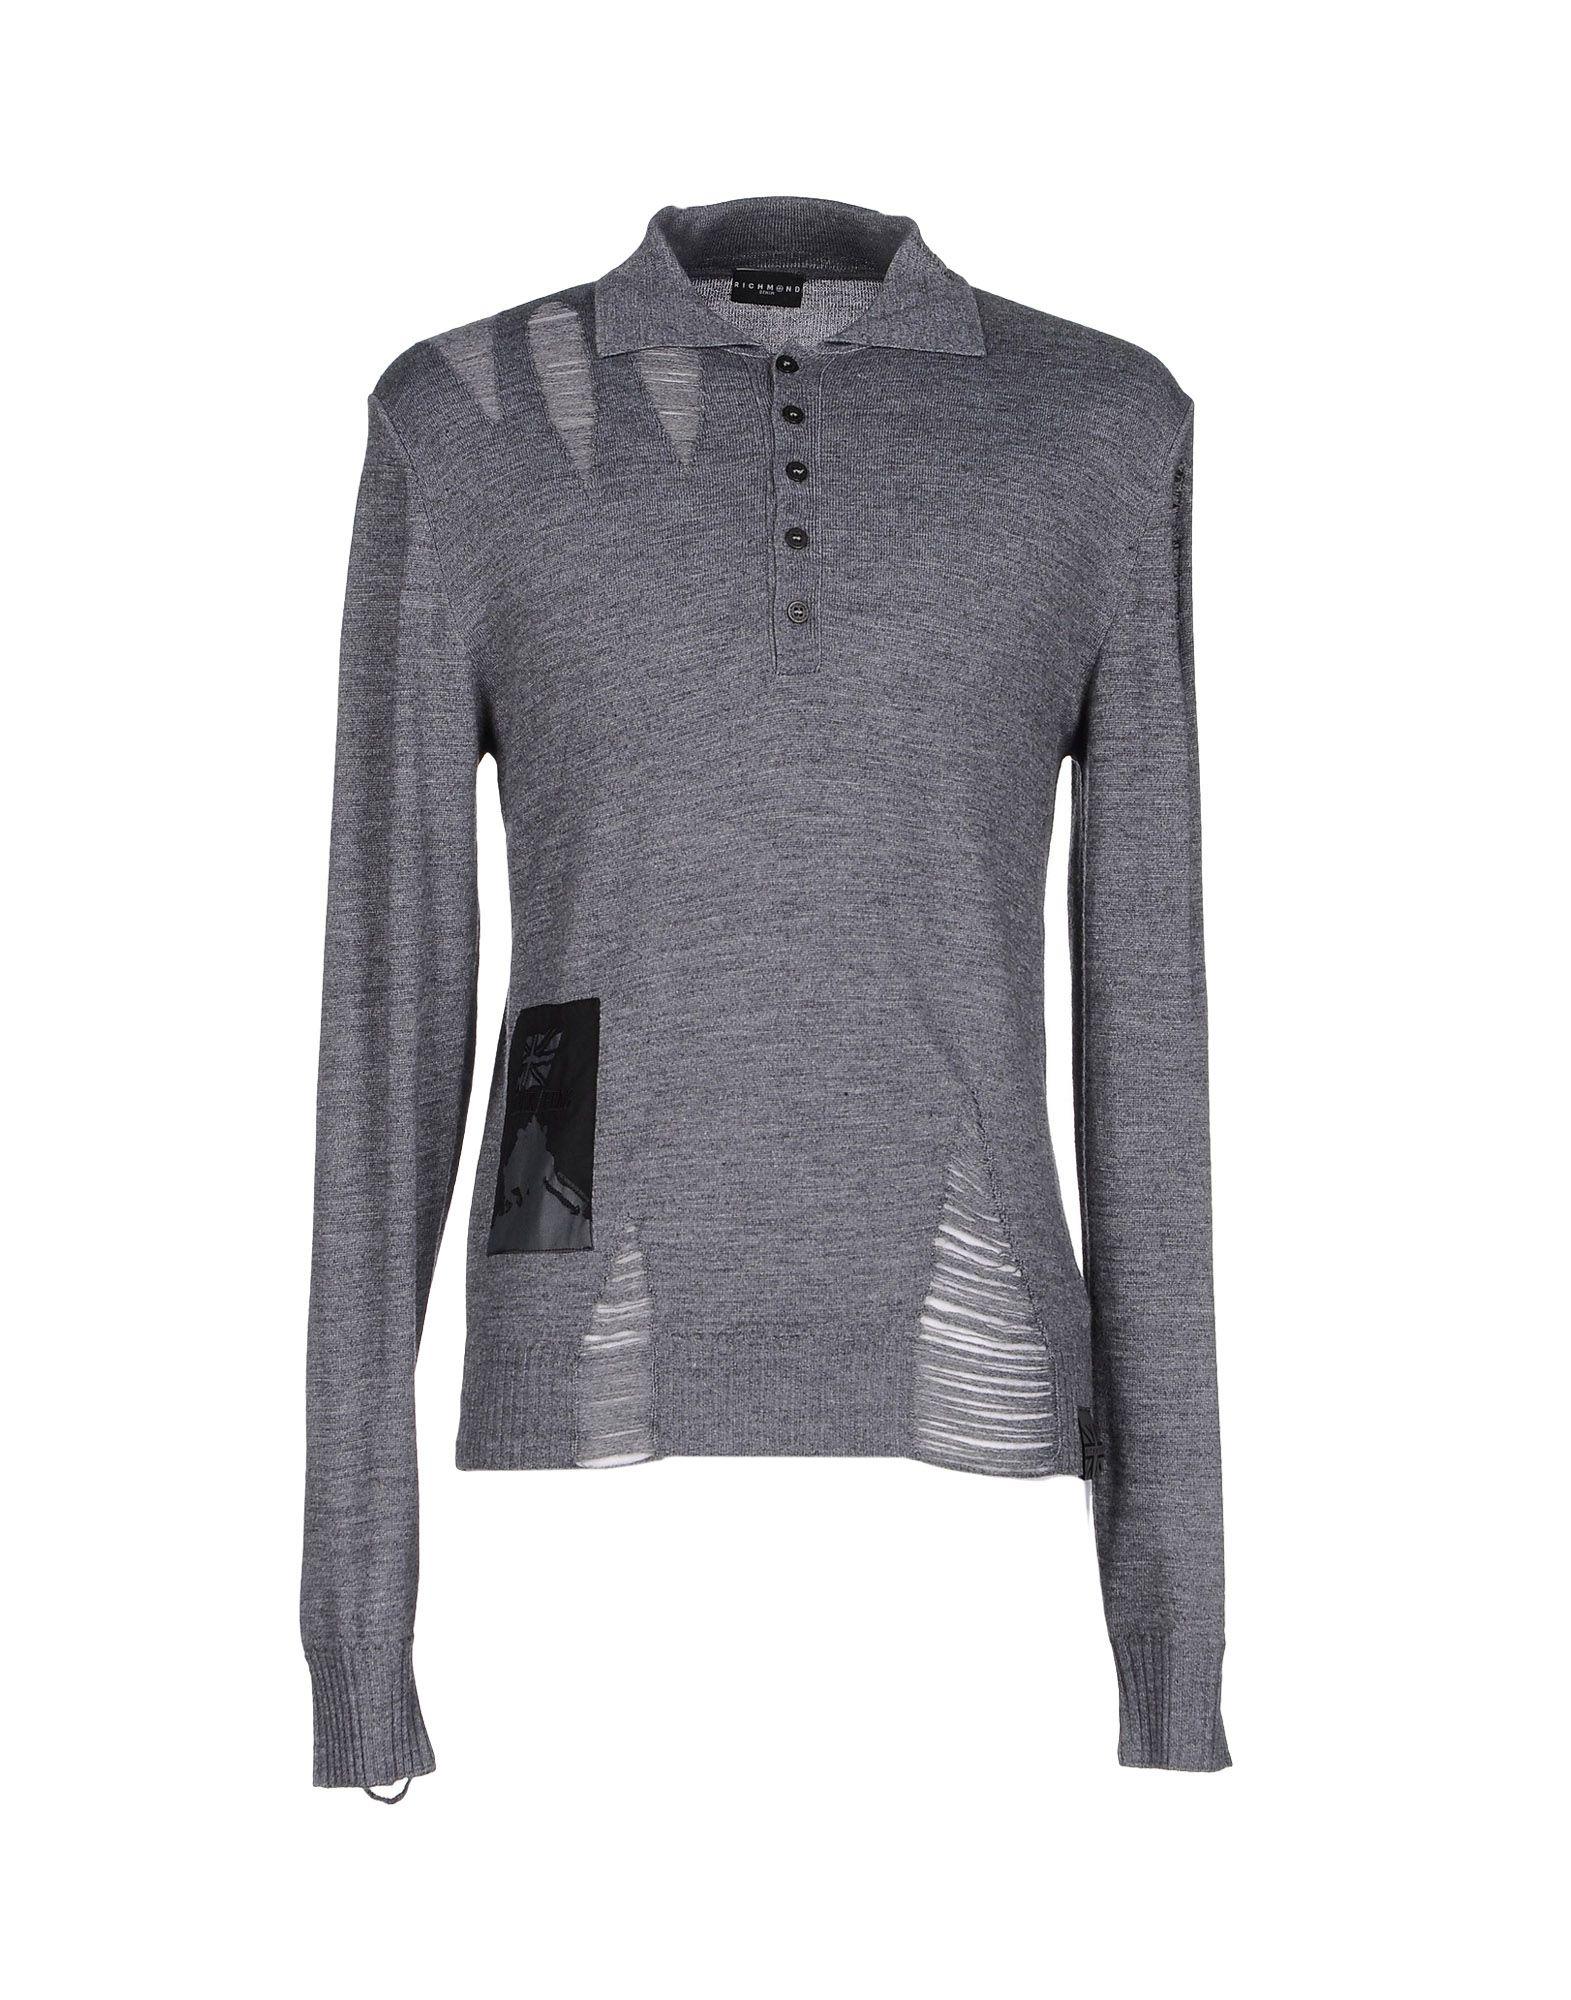 RICHMOND DENIM Sweater in Lead